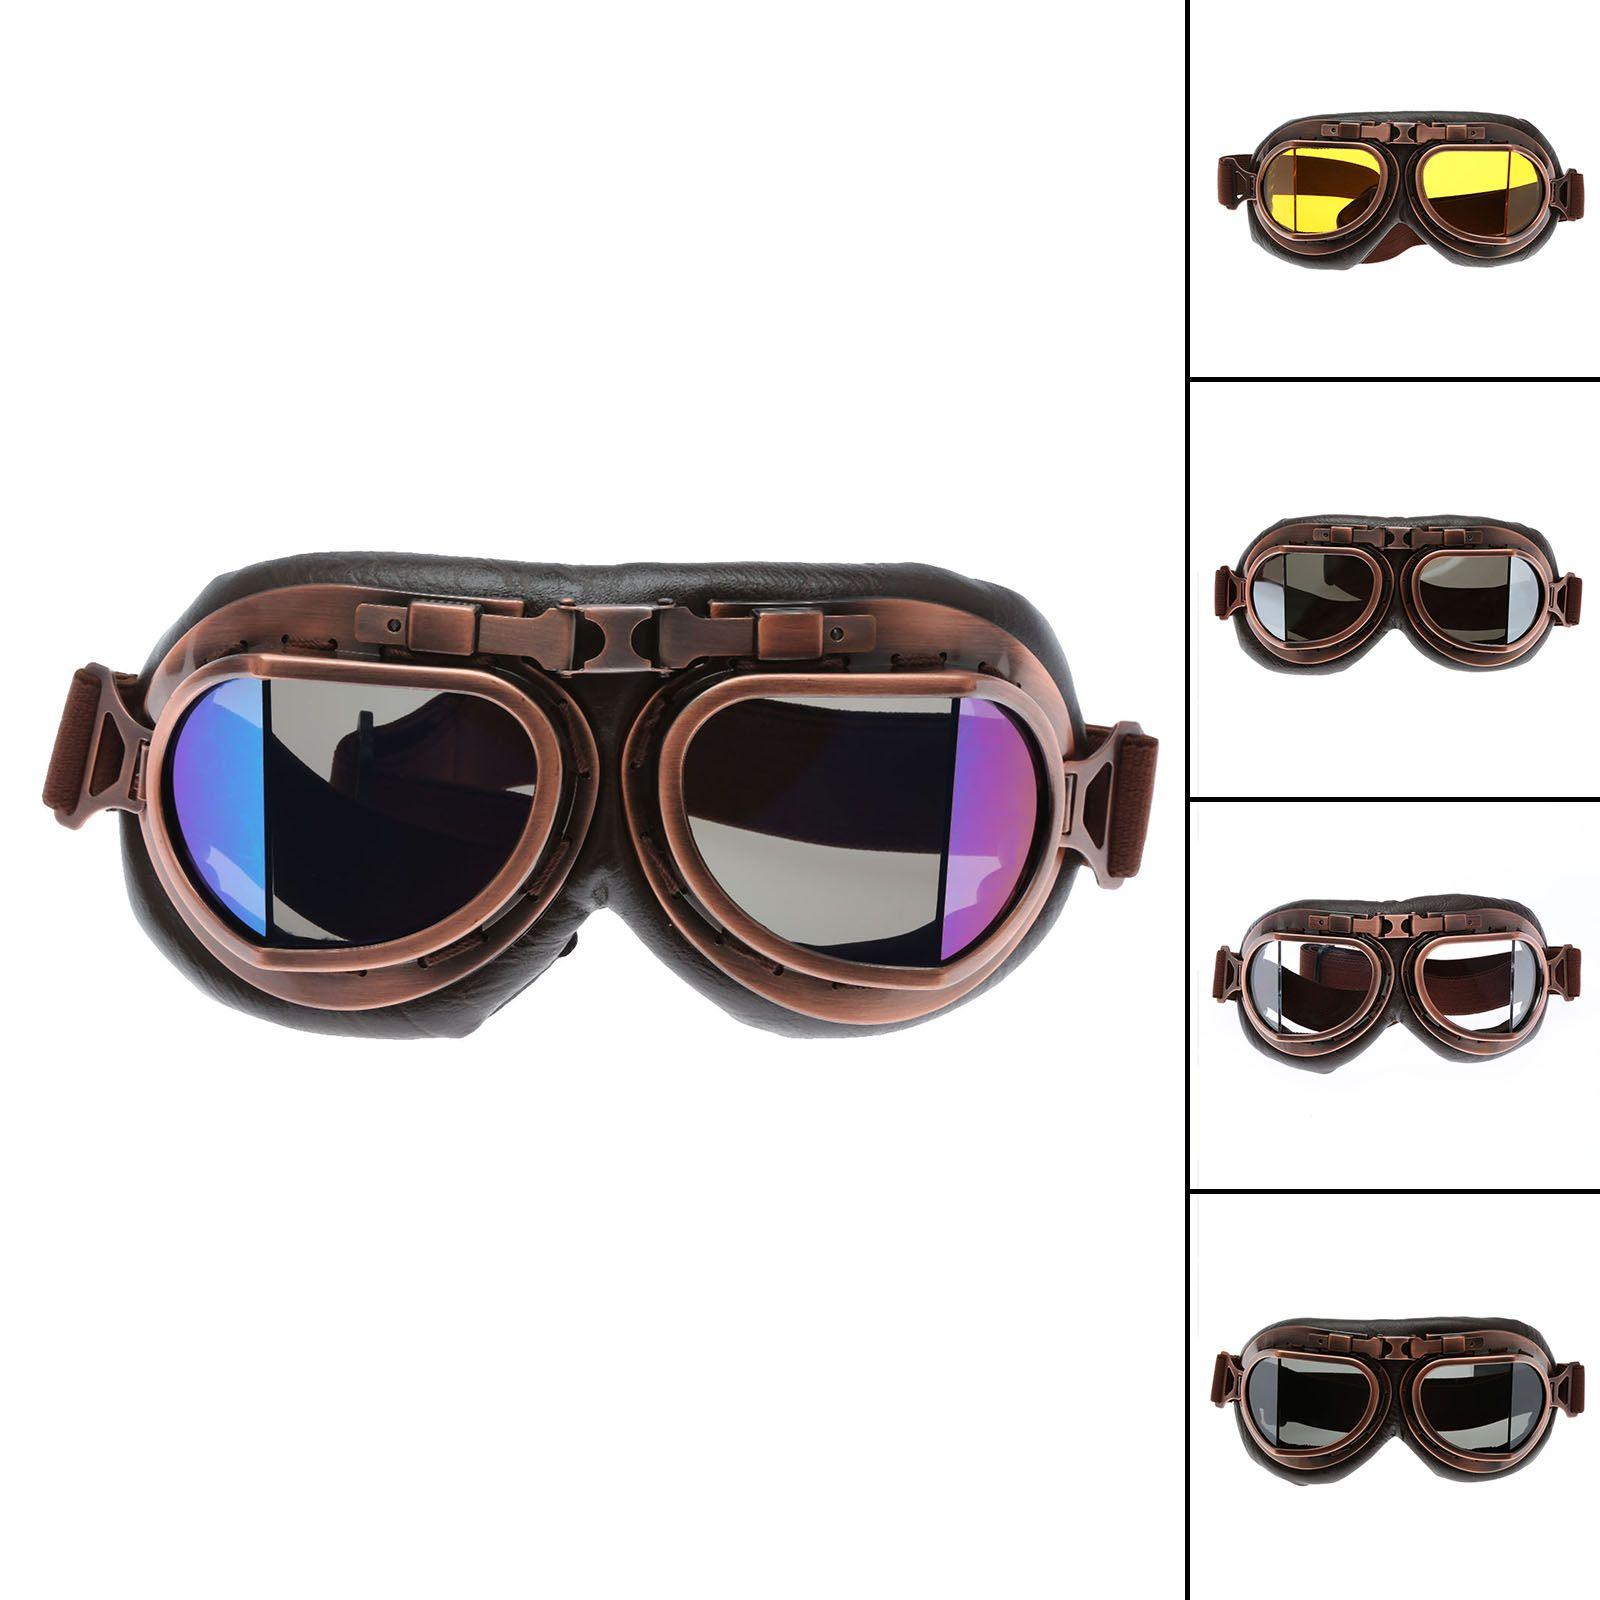 Motorcycle Goggles Glasses Vintage Motocross Classic Goggles <font><b>Retro</b></font> Aviator Pilot Cruiser Steampunk ATV Bike UV Protection Copper